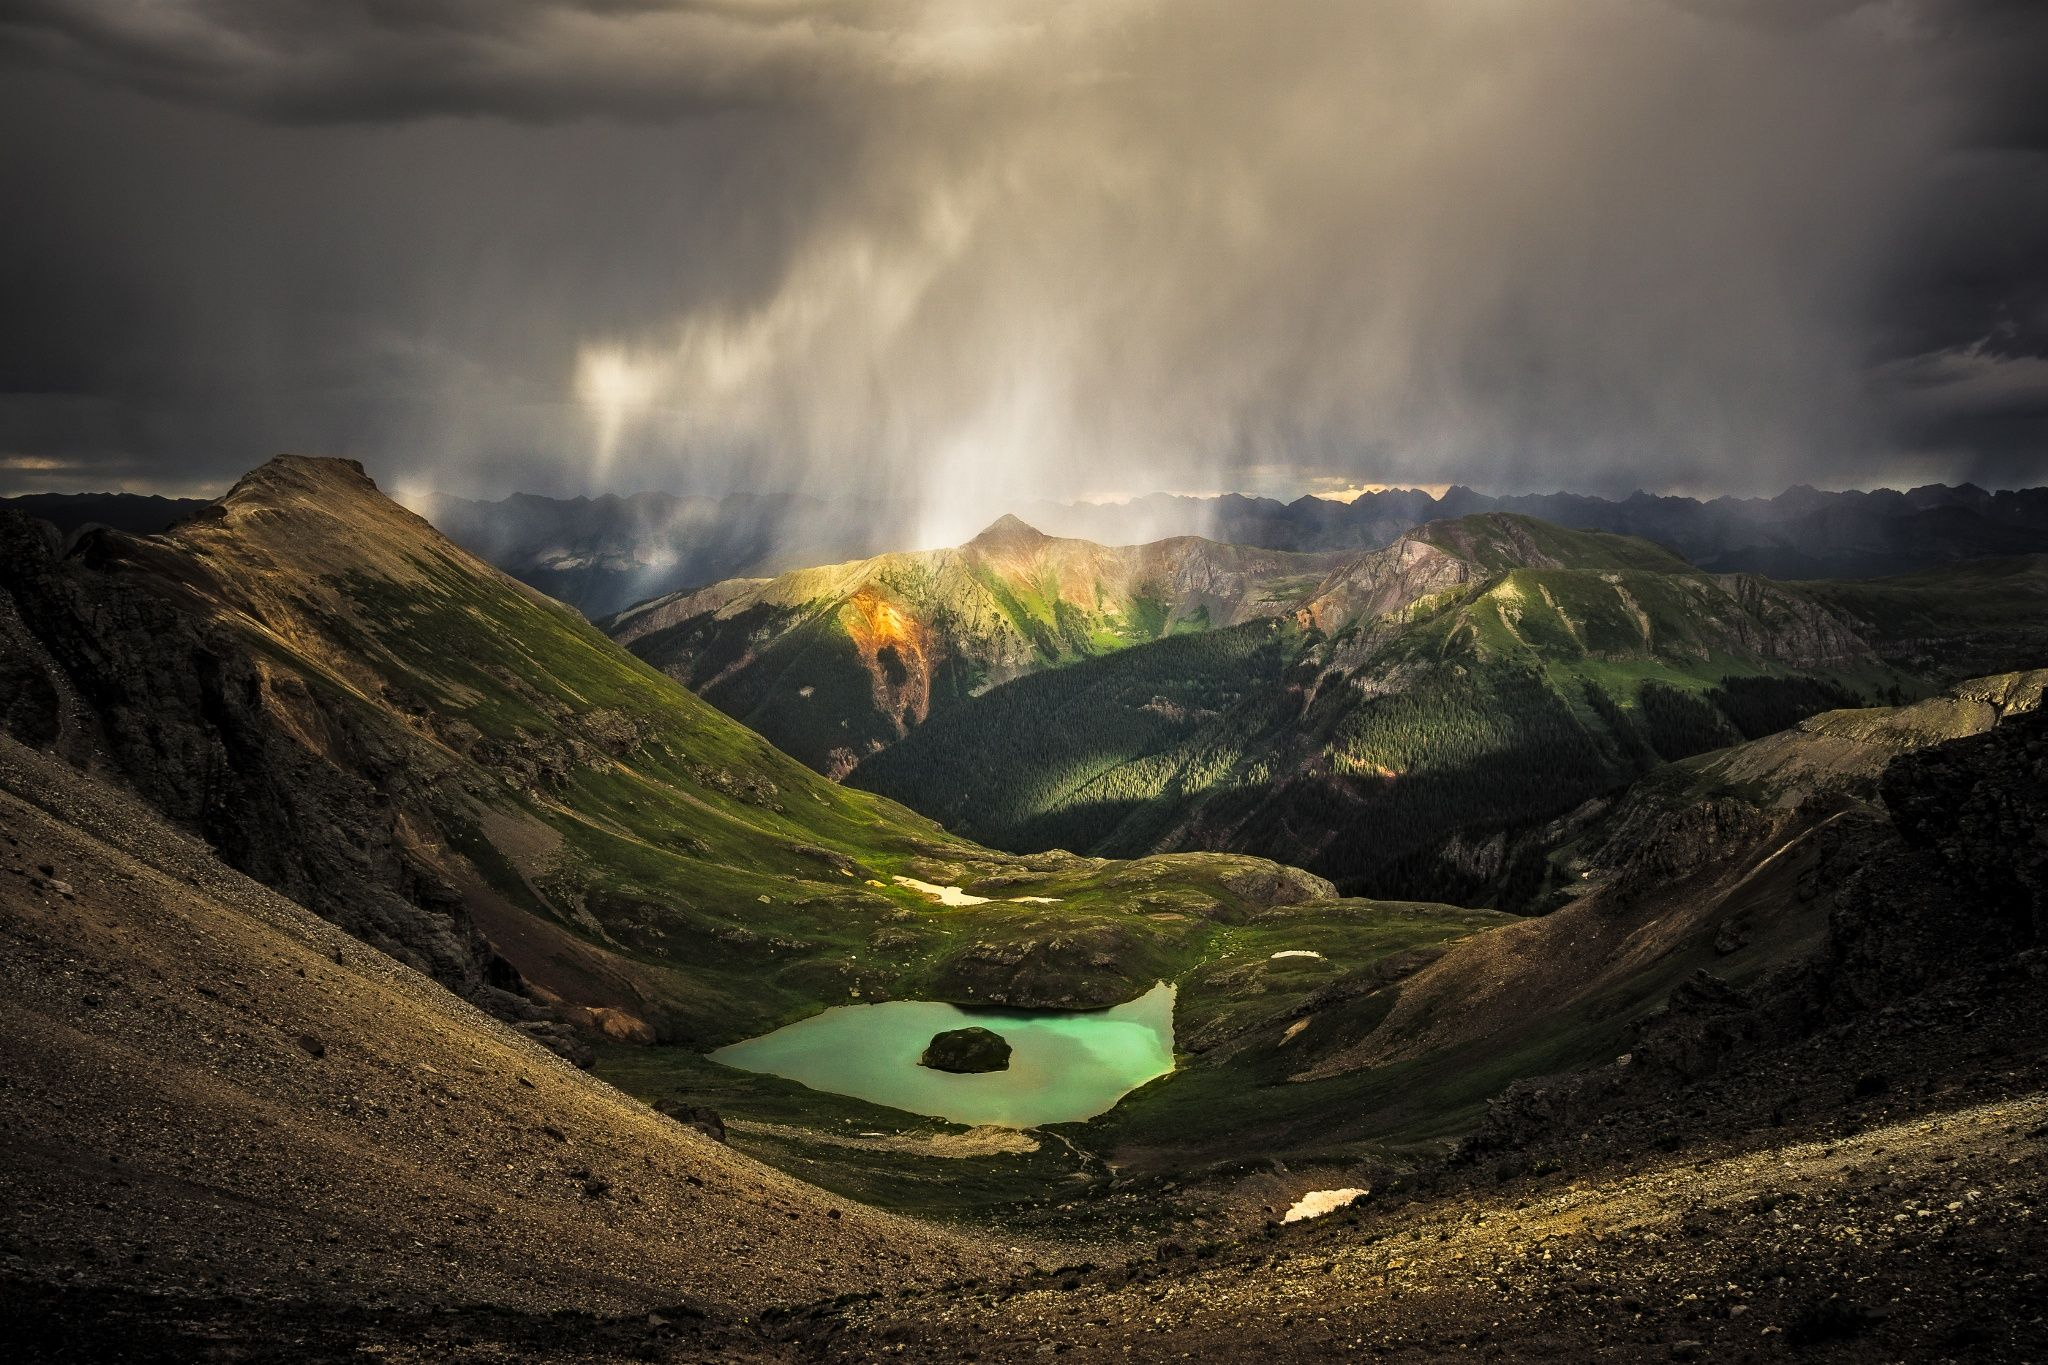 Island Lake by Whit Richardson on 500px